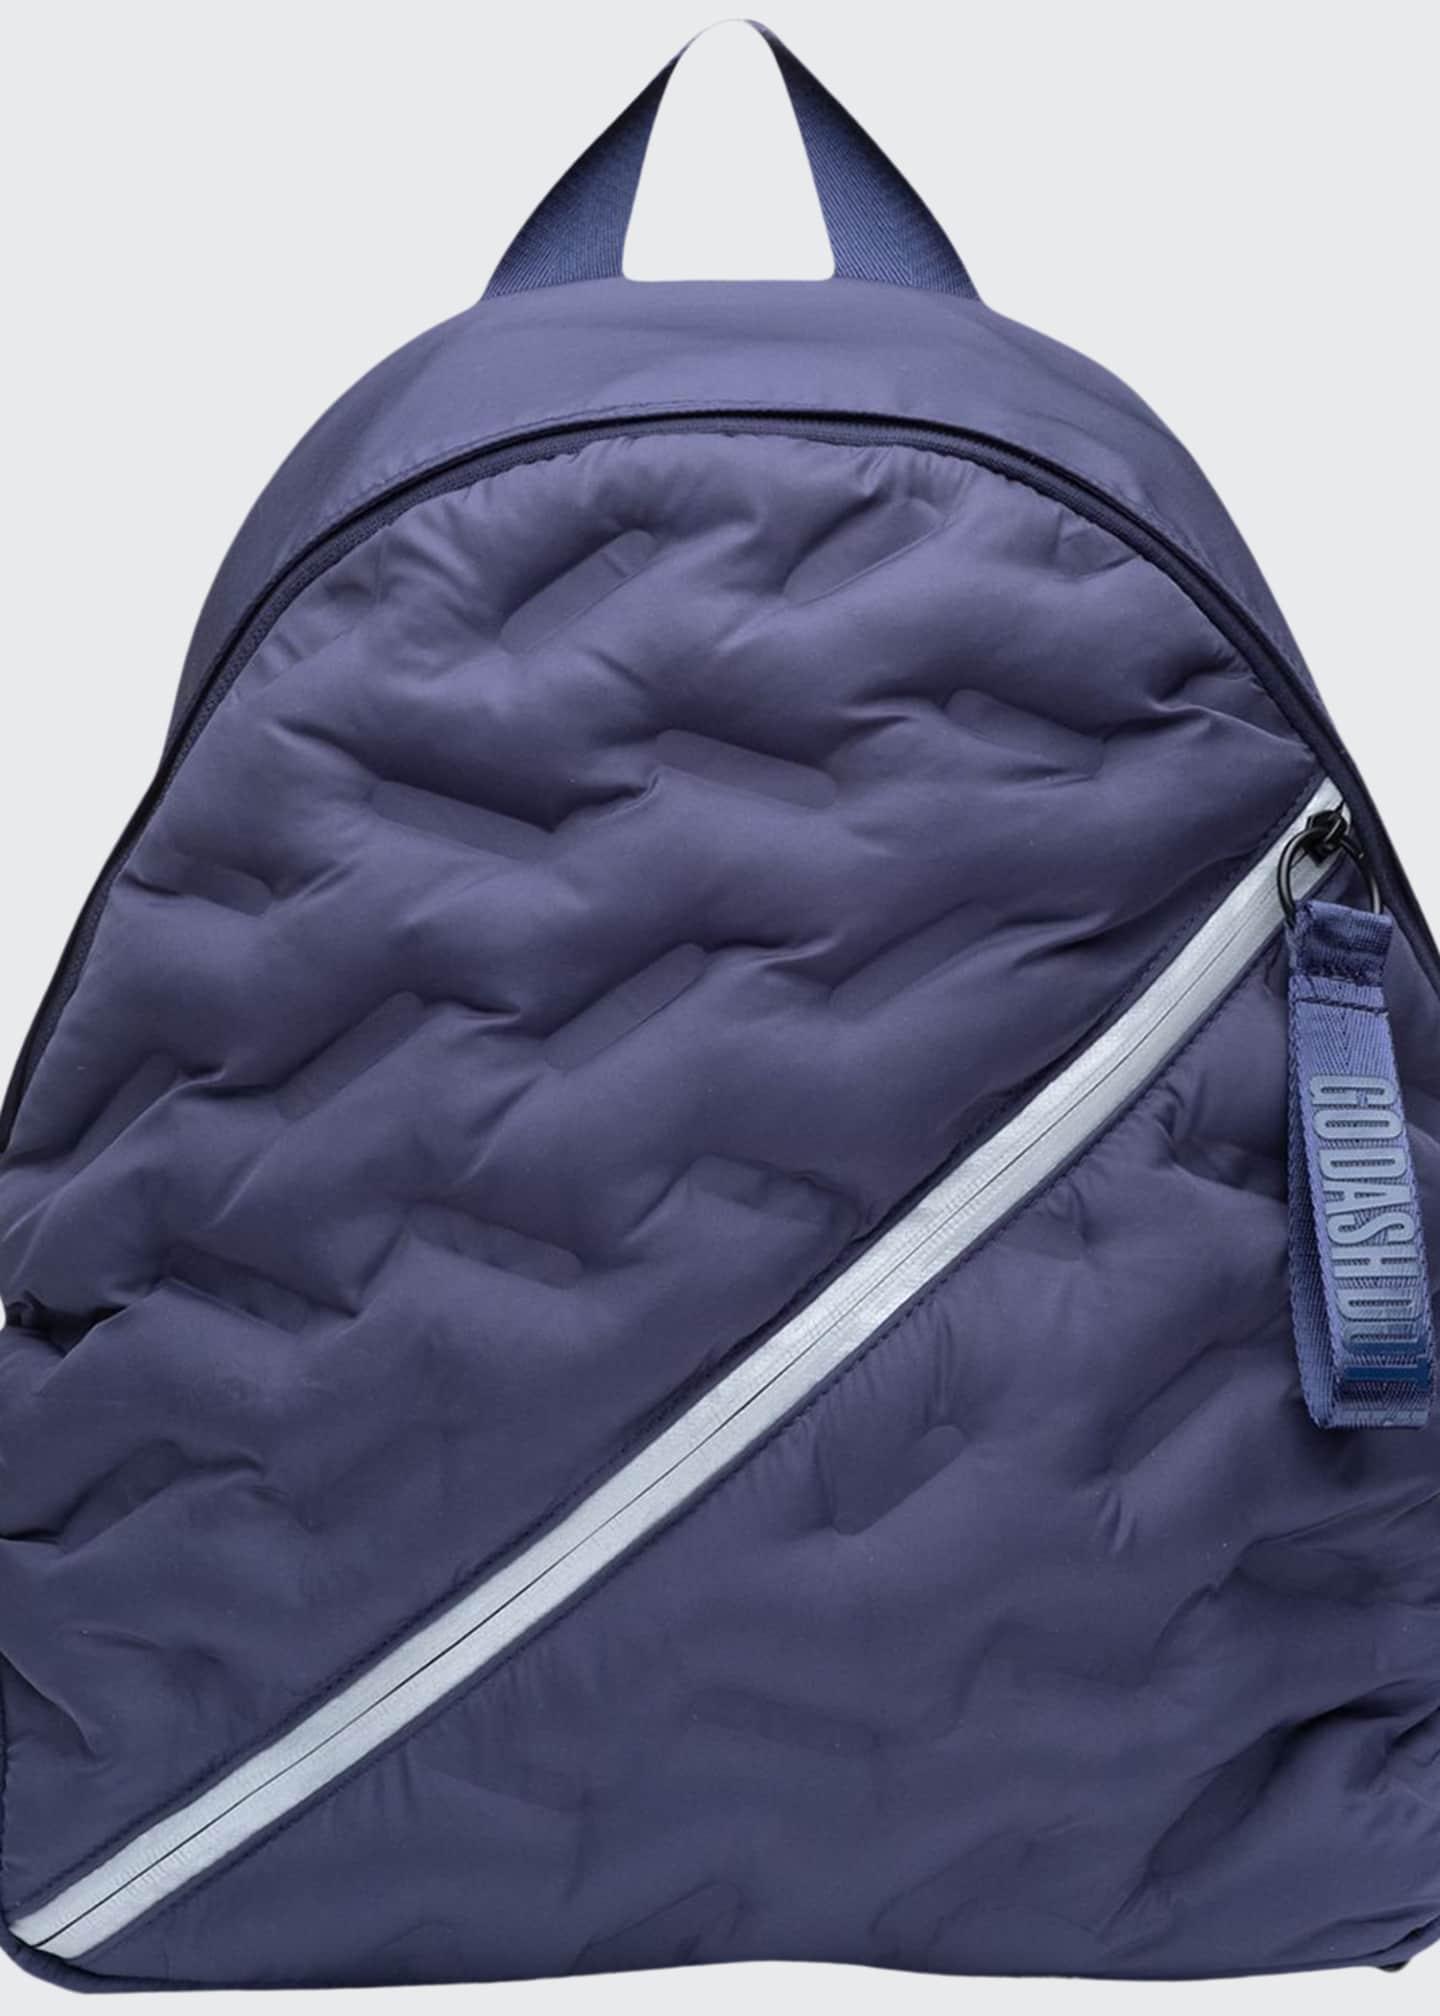 Go Dash Dot Puffy Backpack